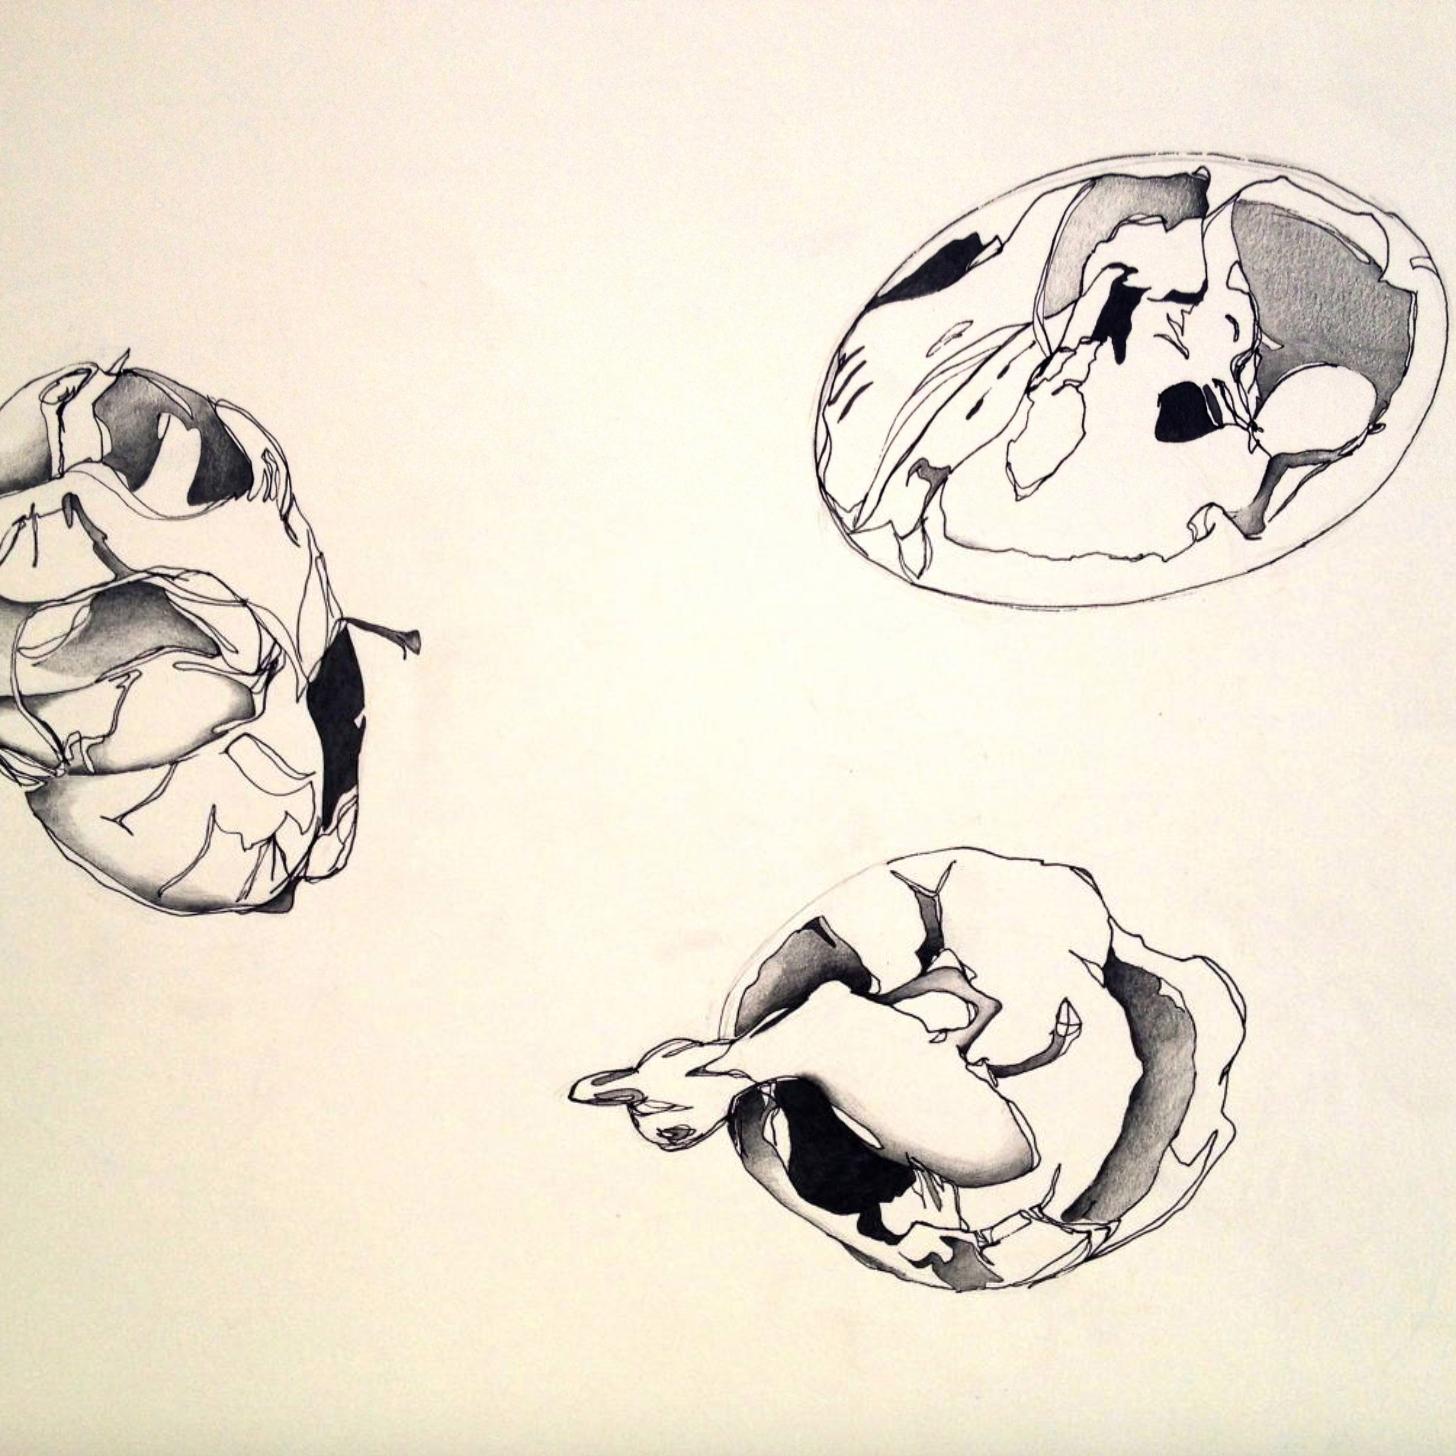 On Grandma and Balut by Melinda Luisa de Jesus - —after